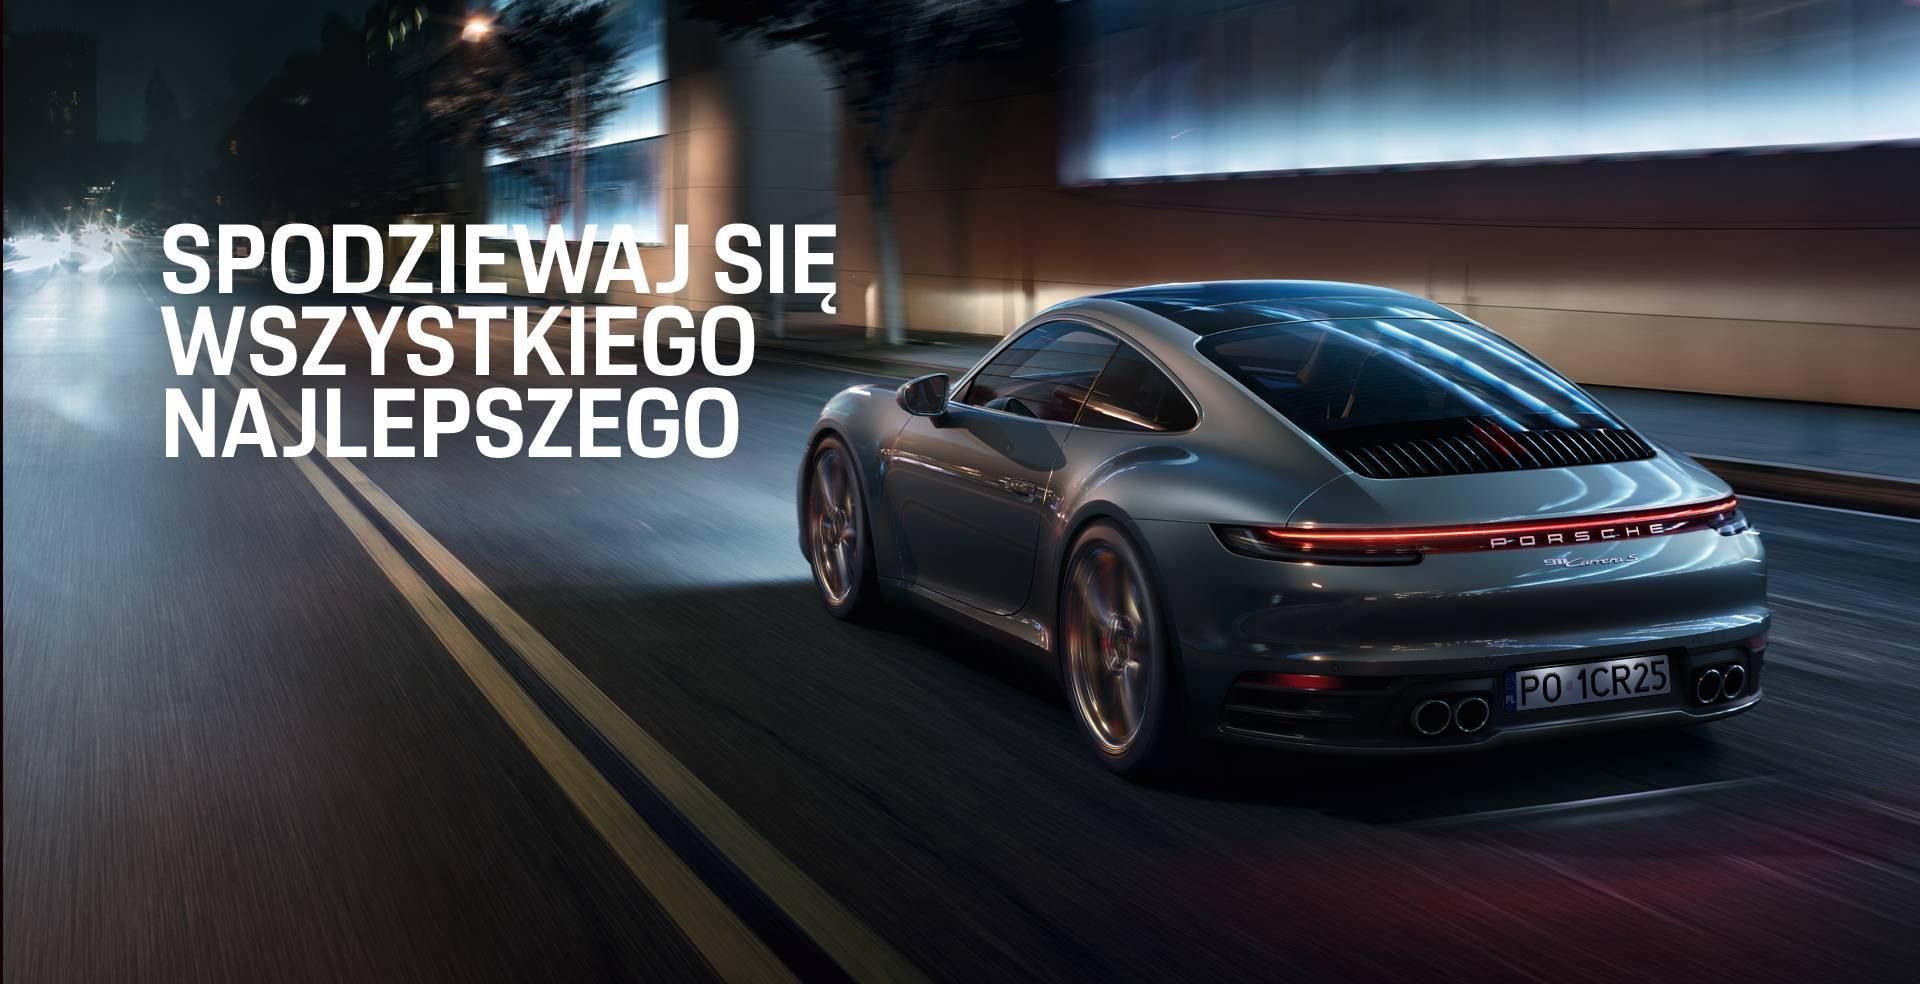 11 rocznica. Porsche Centrum Poznań